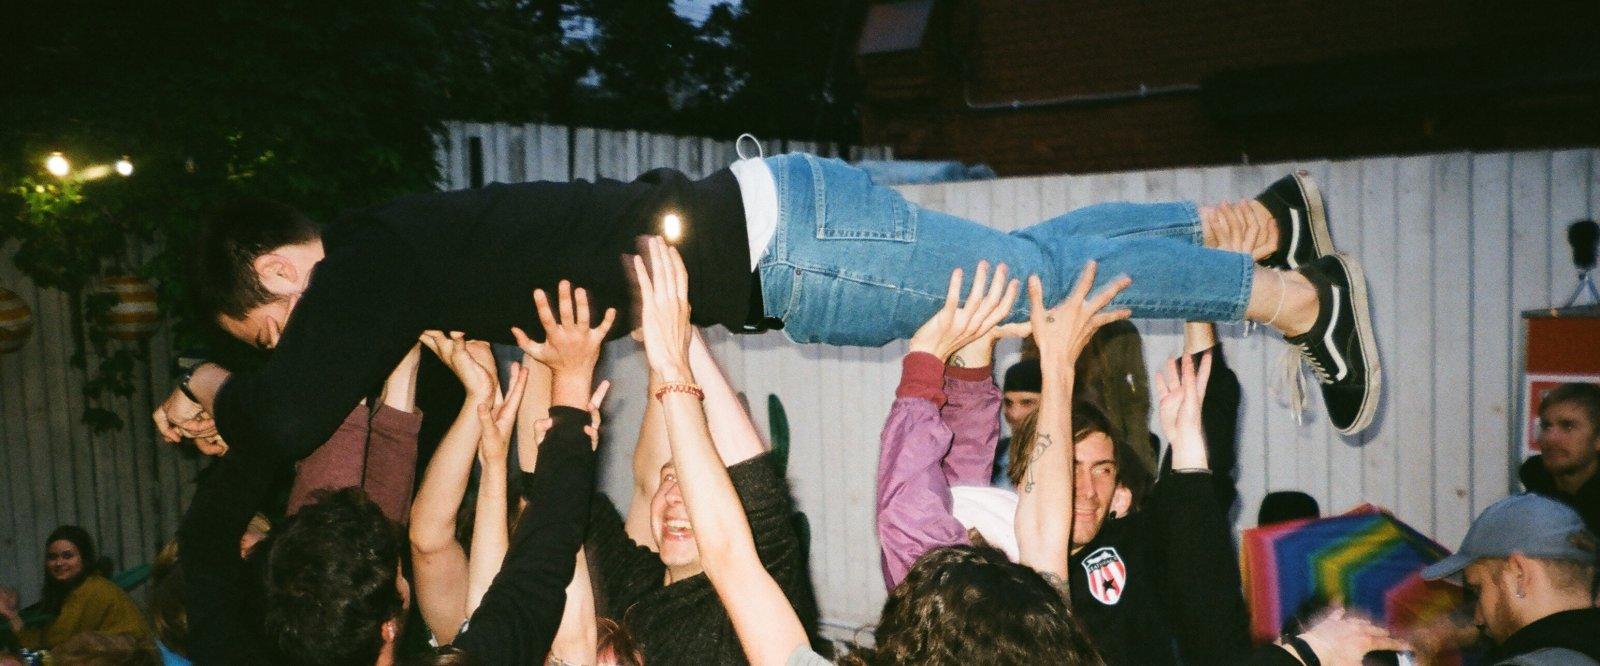 people-lifting-man-at-night-2601200.jpg